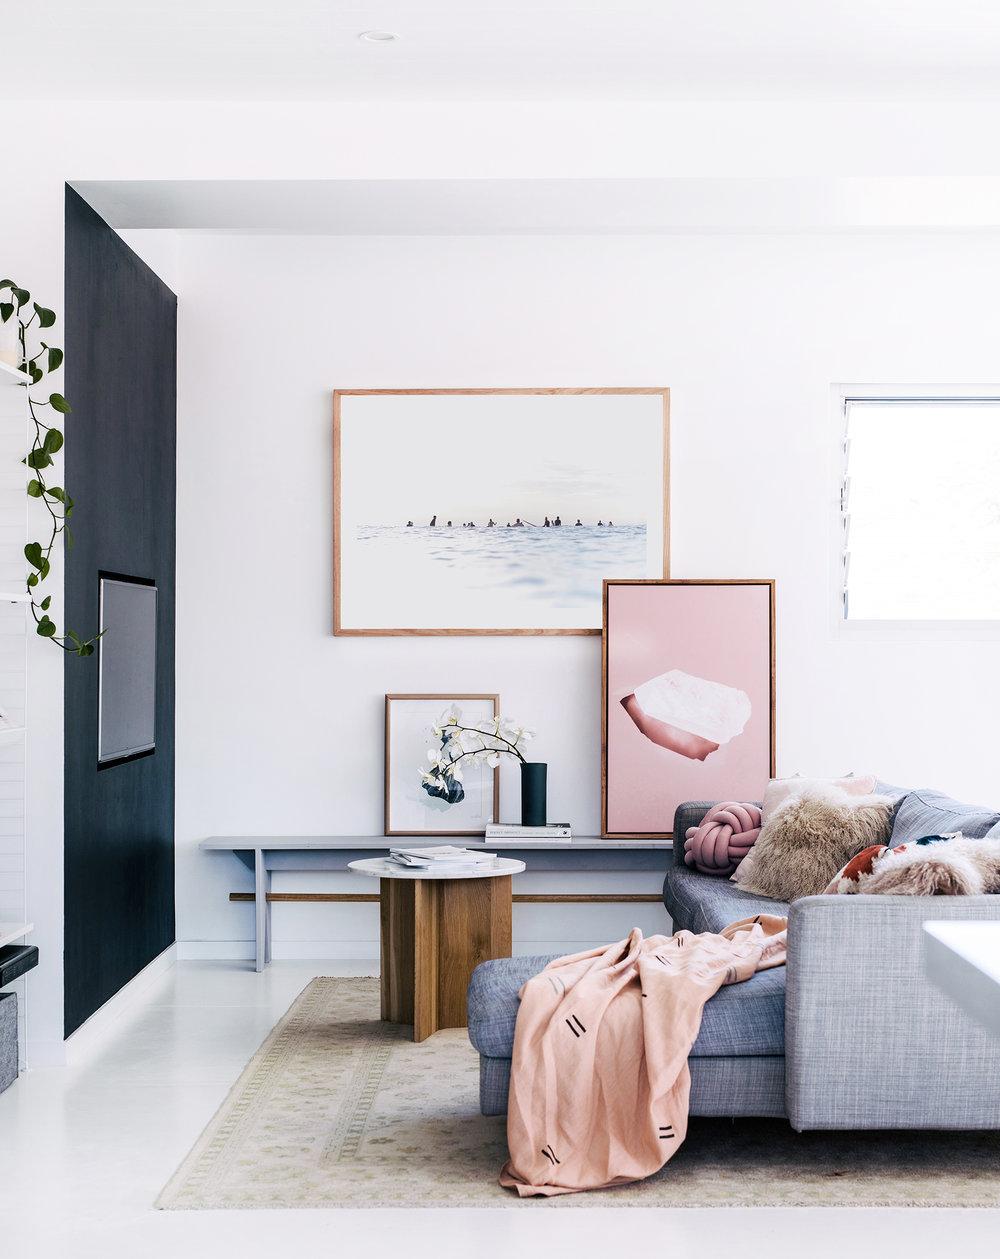 Interior design  Nicola Greenaway  /   Photography  Hannah Blackmore  /   Styling  Claudia Stephenson